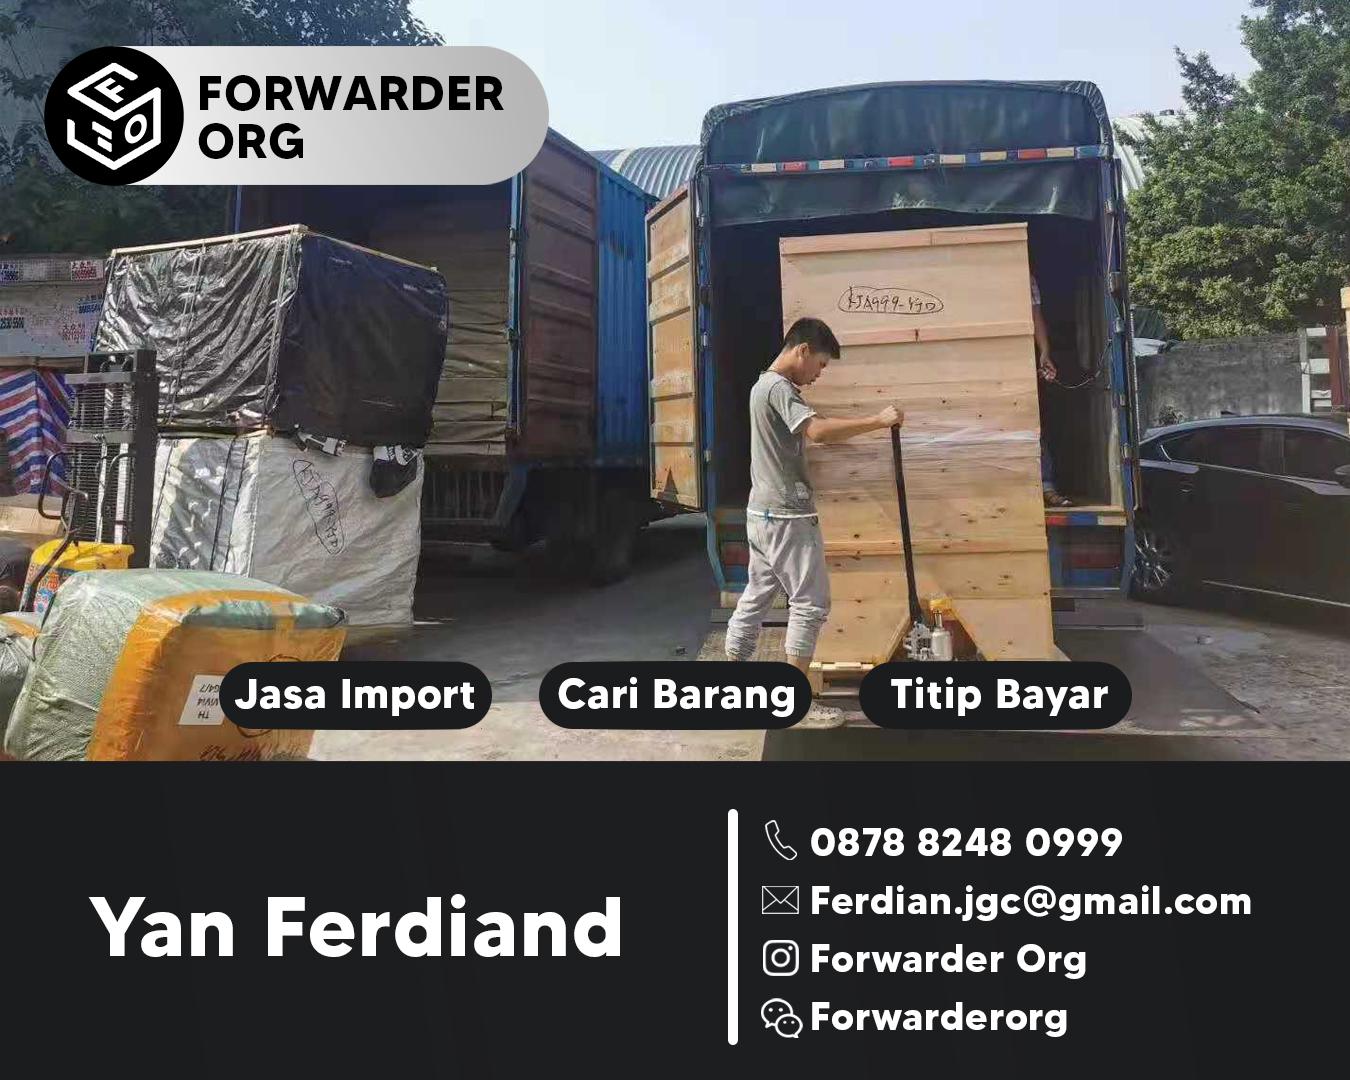 Jasa Import Singapore Resmi Borongan Jempolan | FORWARDER ORG